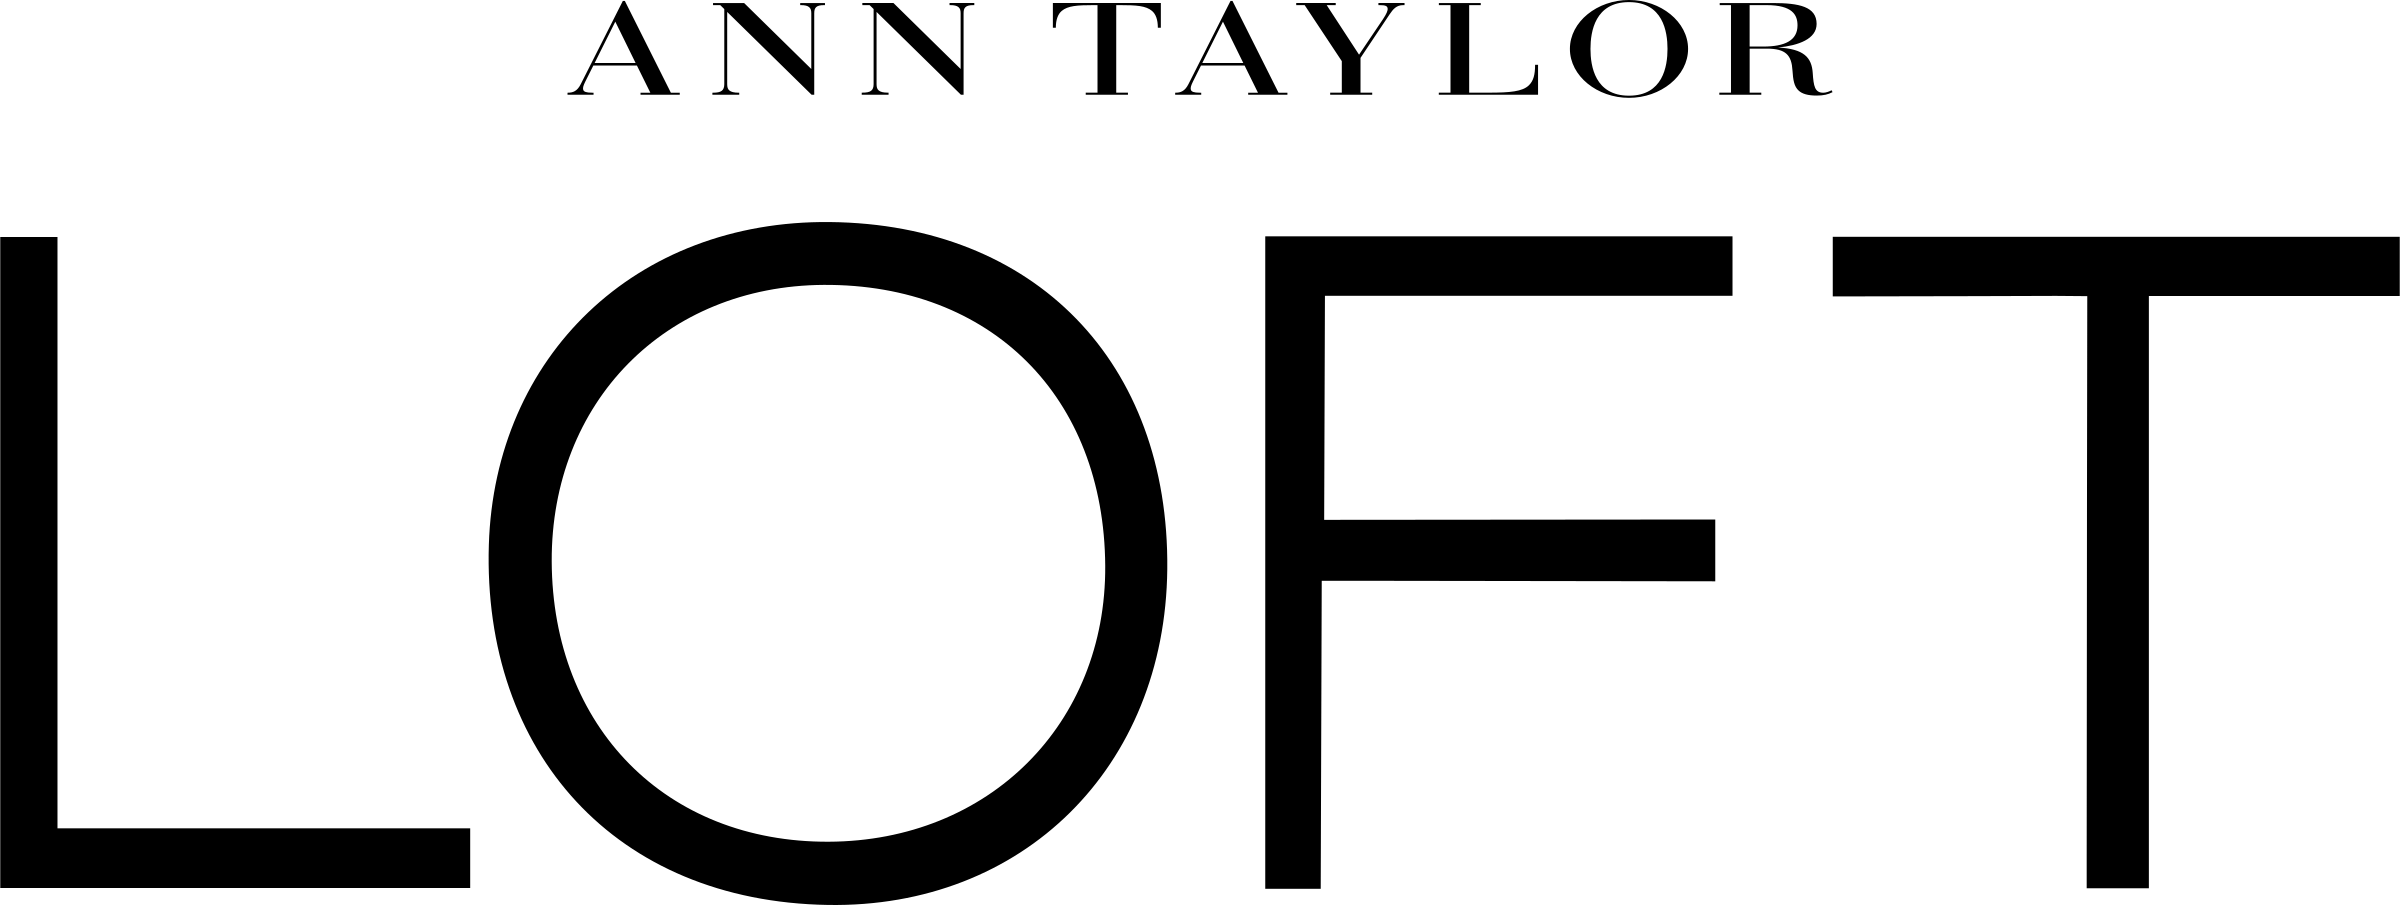 Ann Taylor LOFT Logo PNG Transparent & SVG Vector.